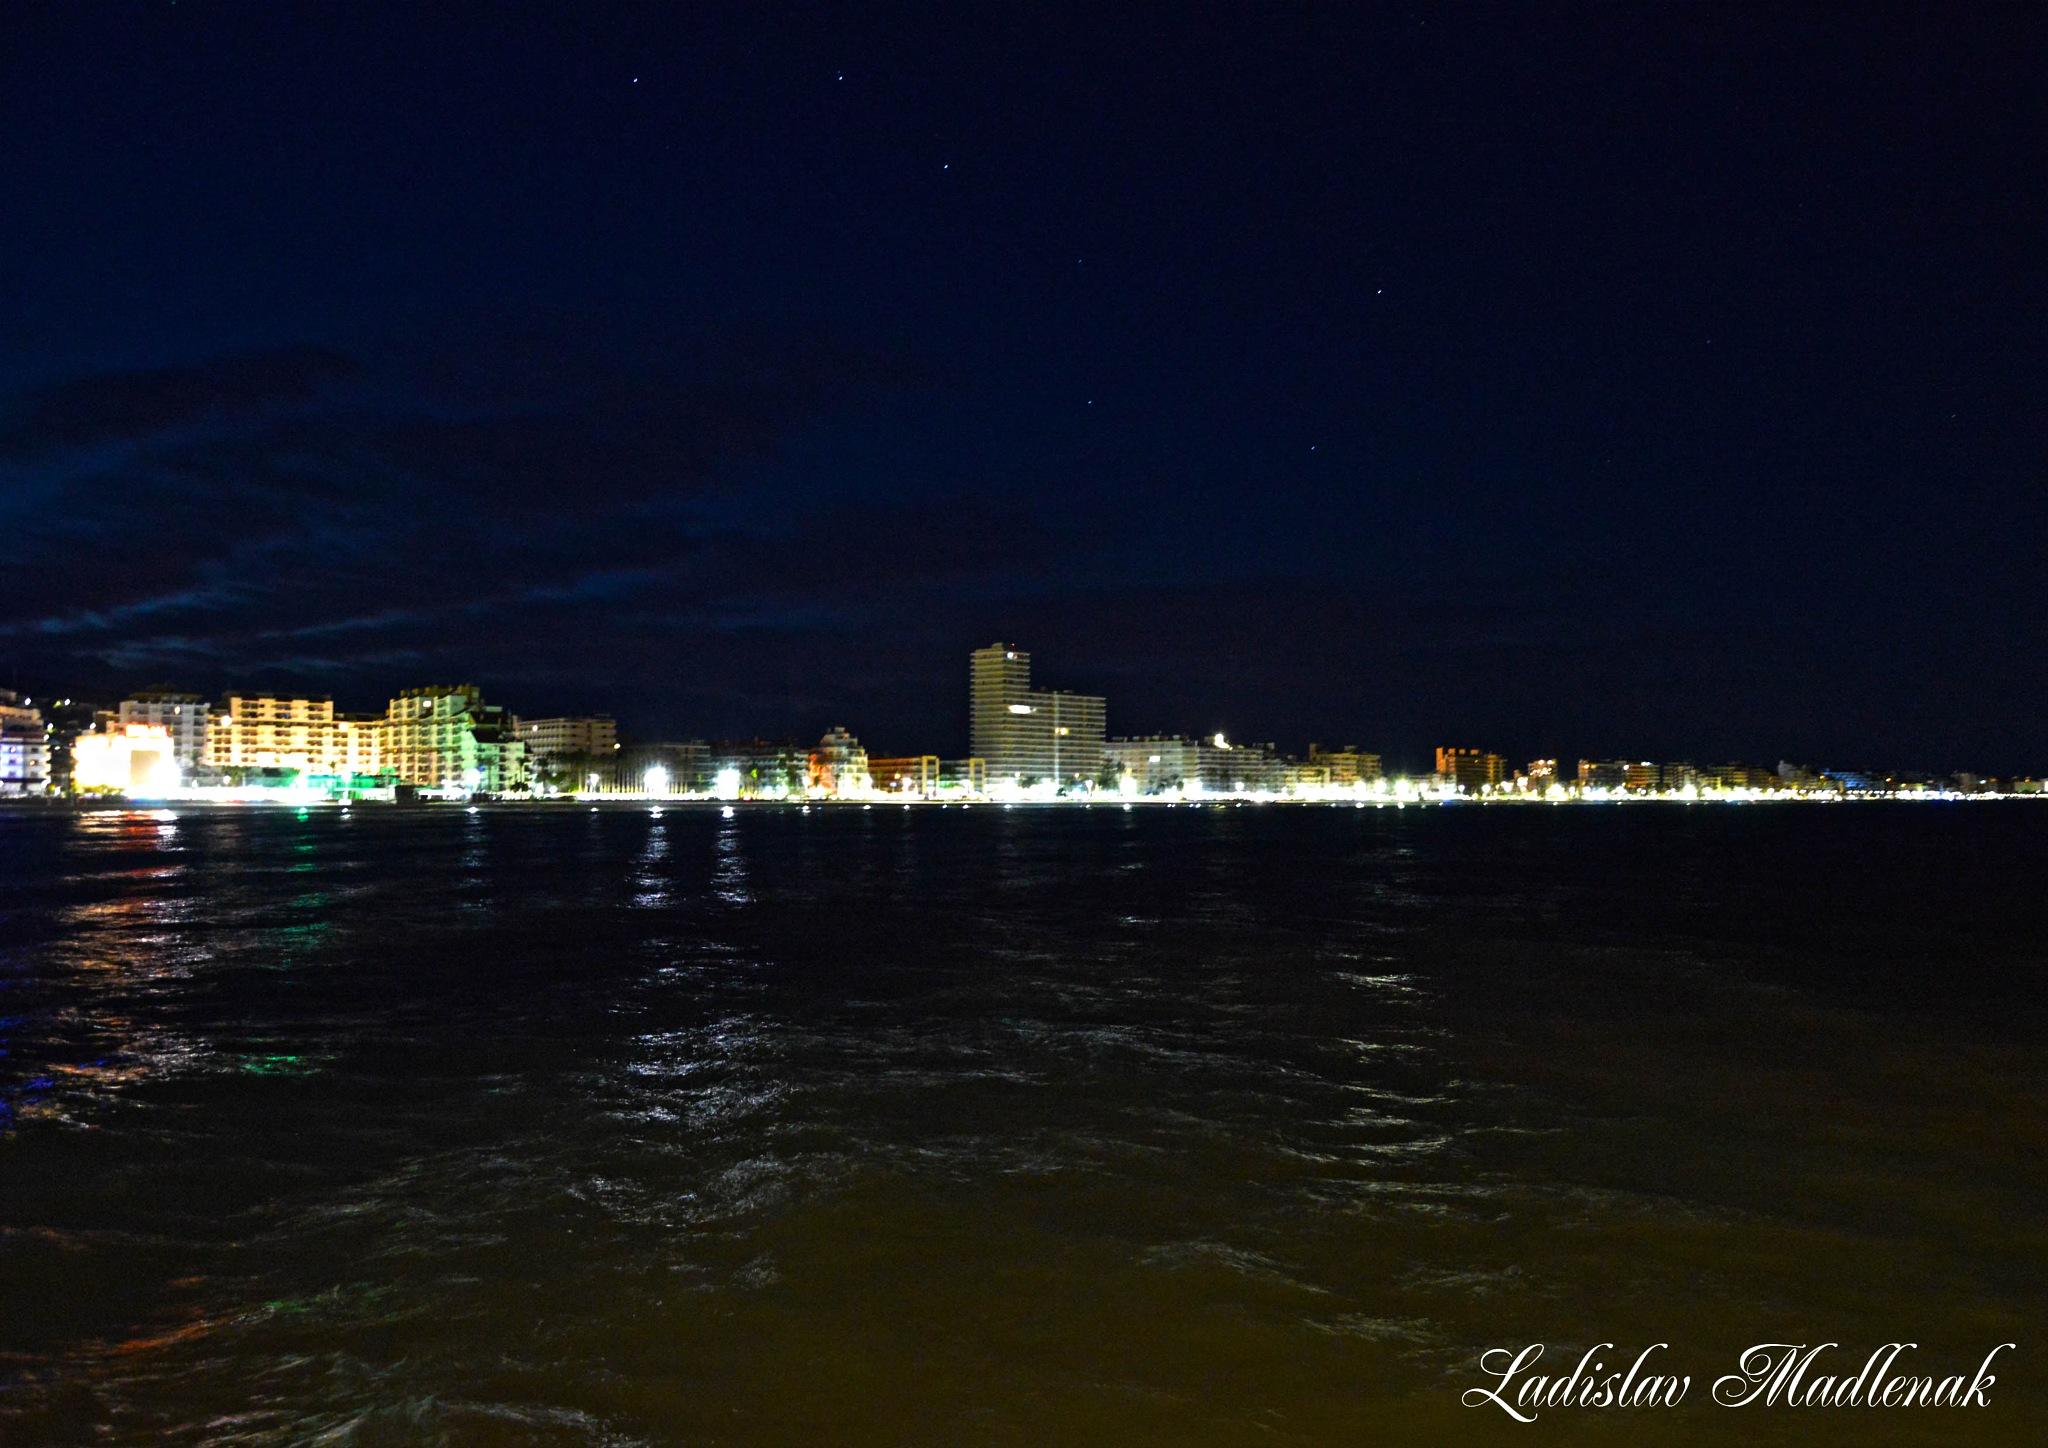 City under stars by LLadislav Madlenak